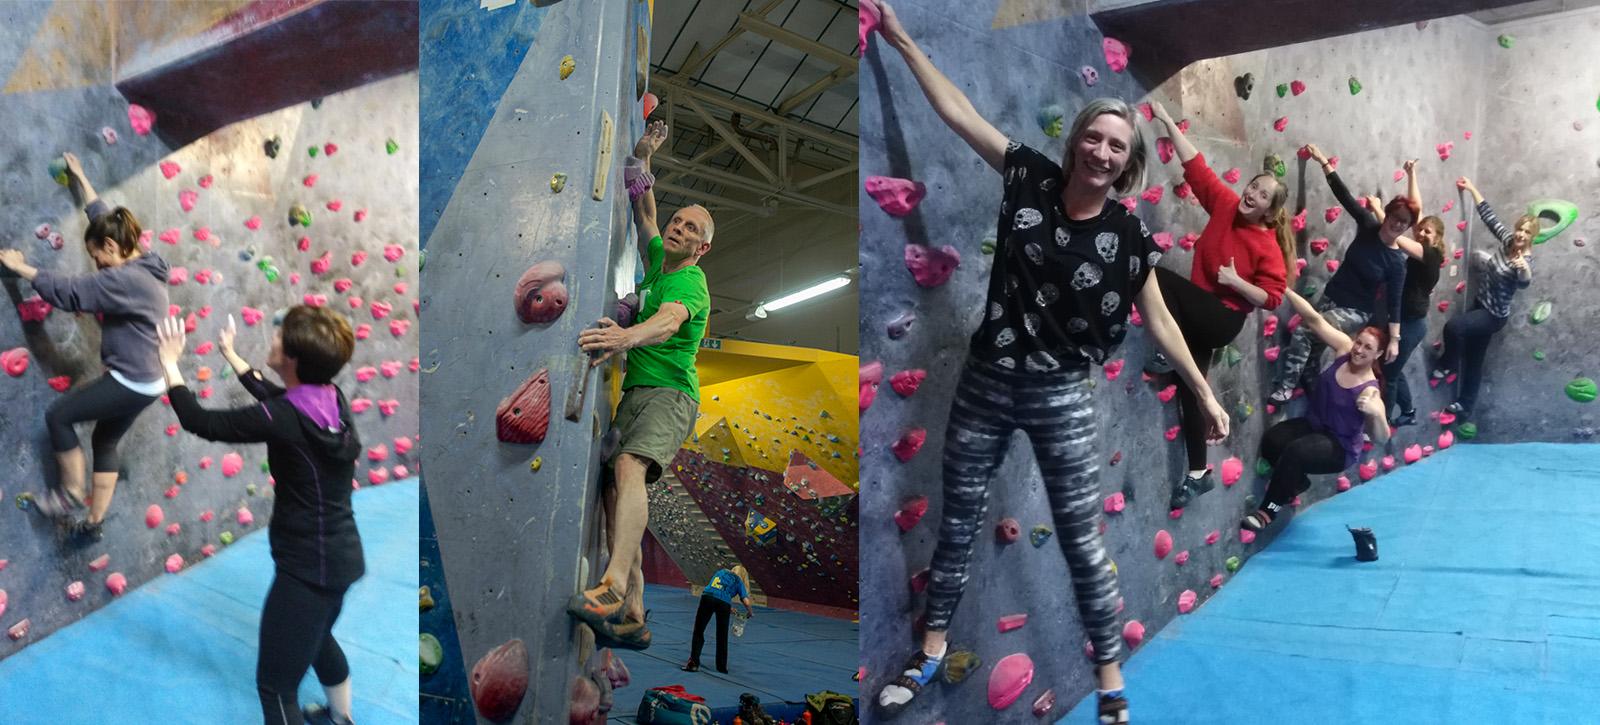 Squad parents climbing